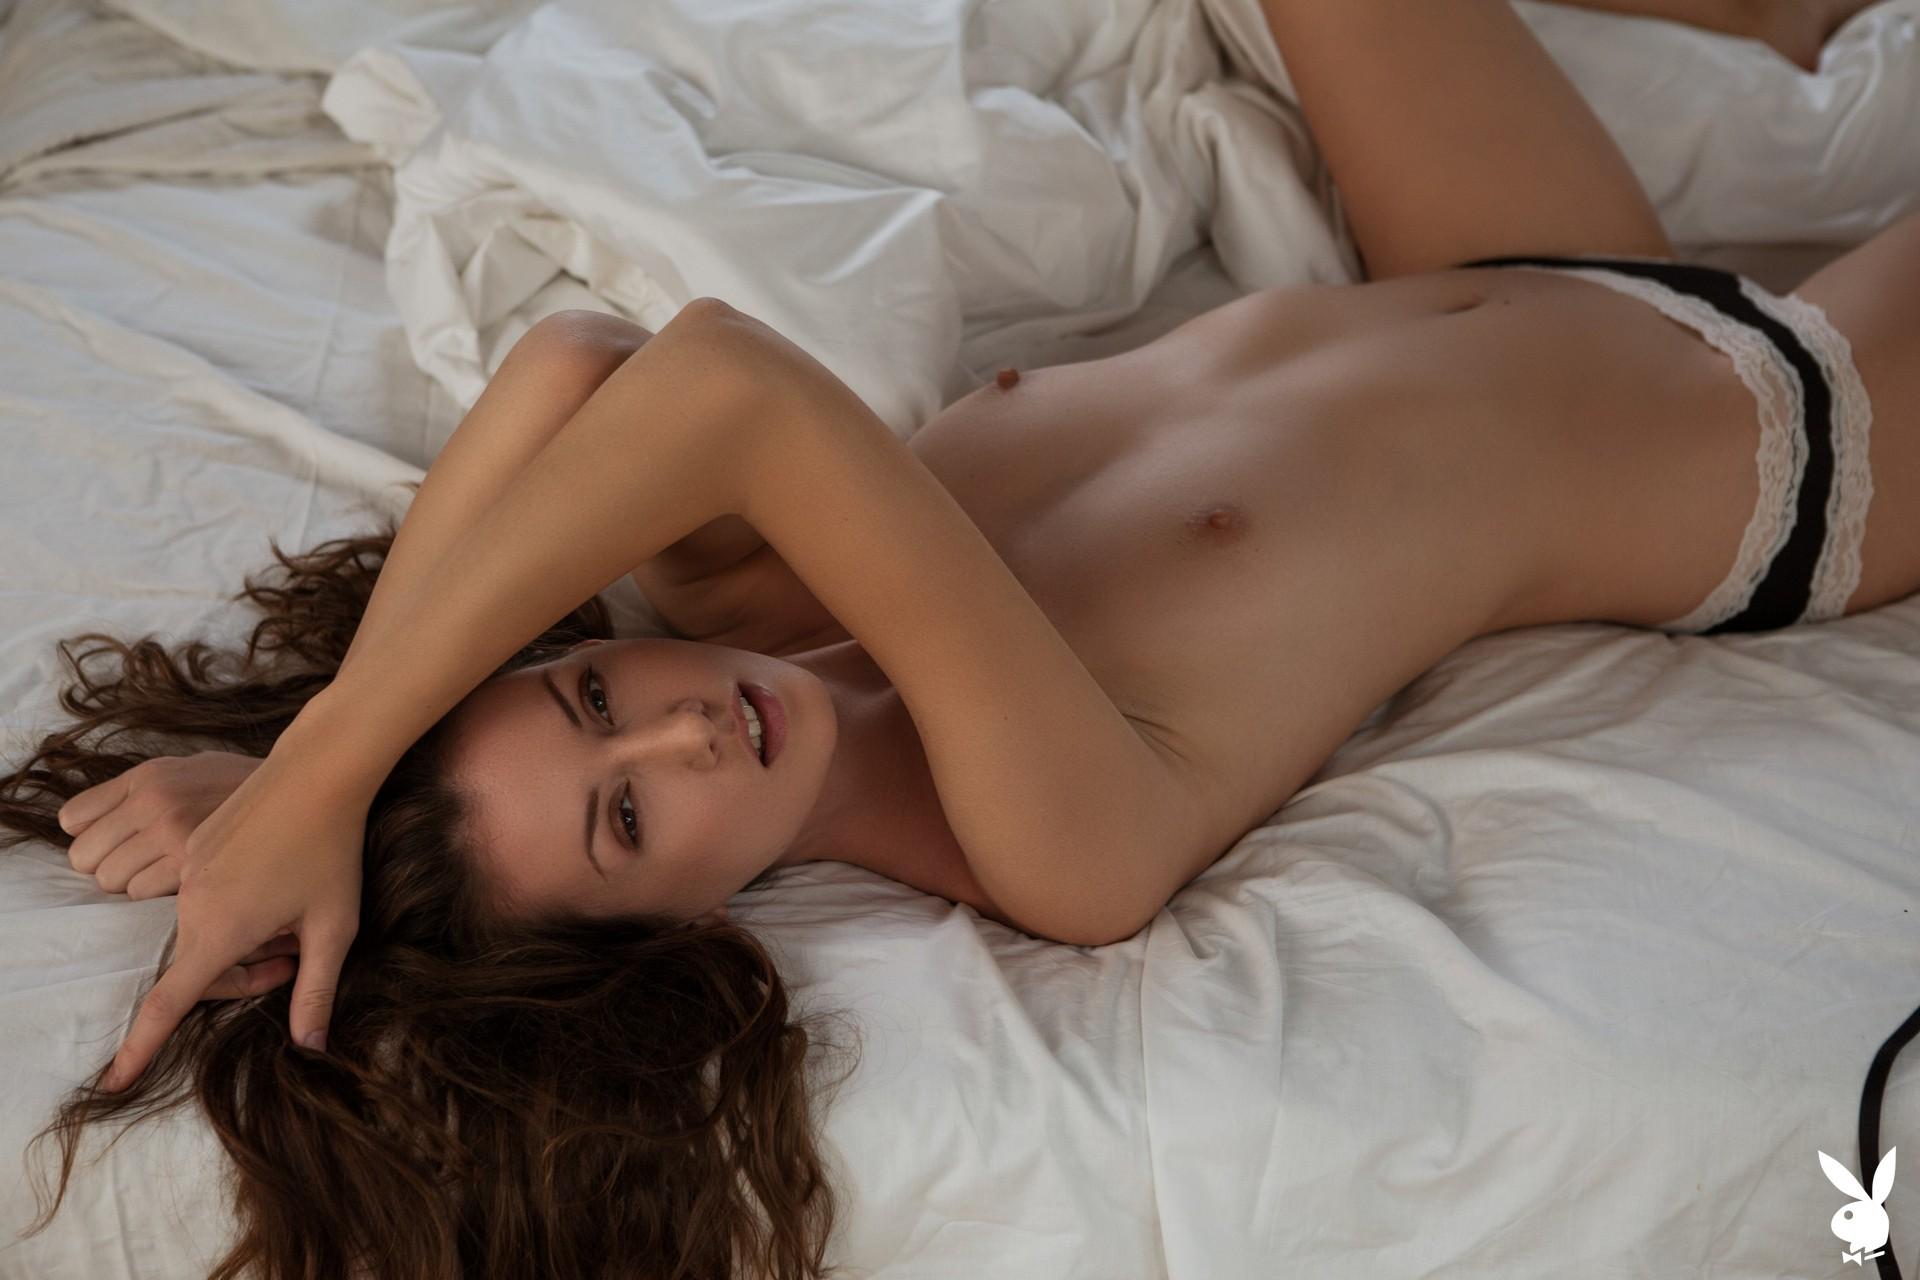 Mikaela Mckenna In Early Awakening Playboy Plus (9)